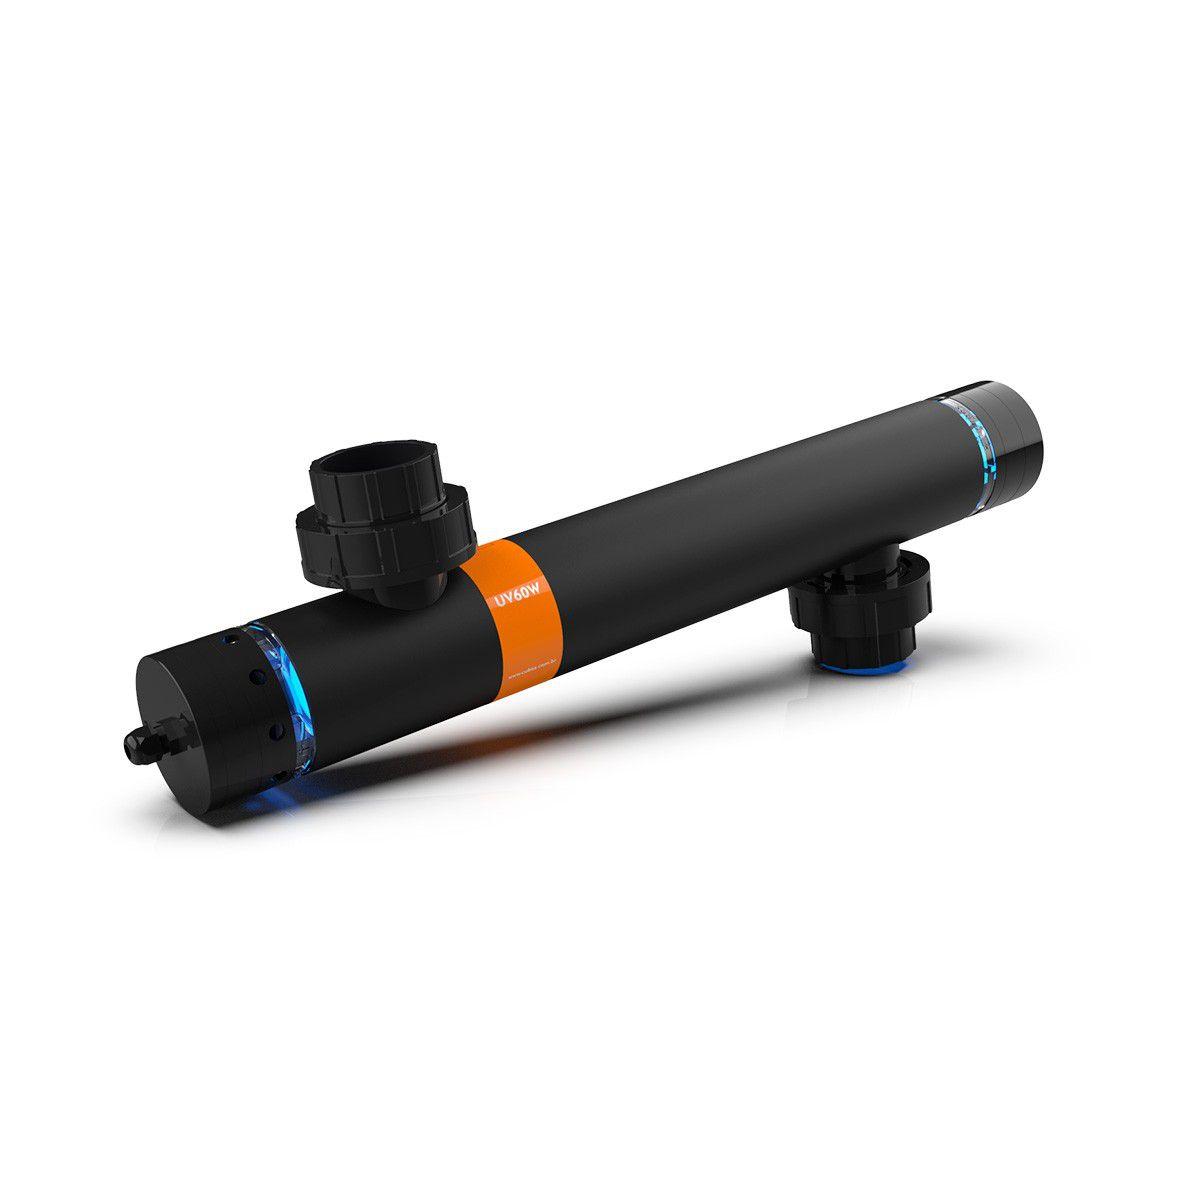 Filtro UV 36W 50mm, Filtro Esterilizador UV-C  36W P/ Lagos 10.000 litros